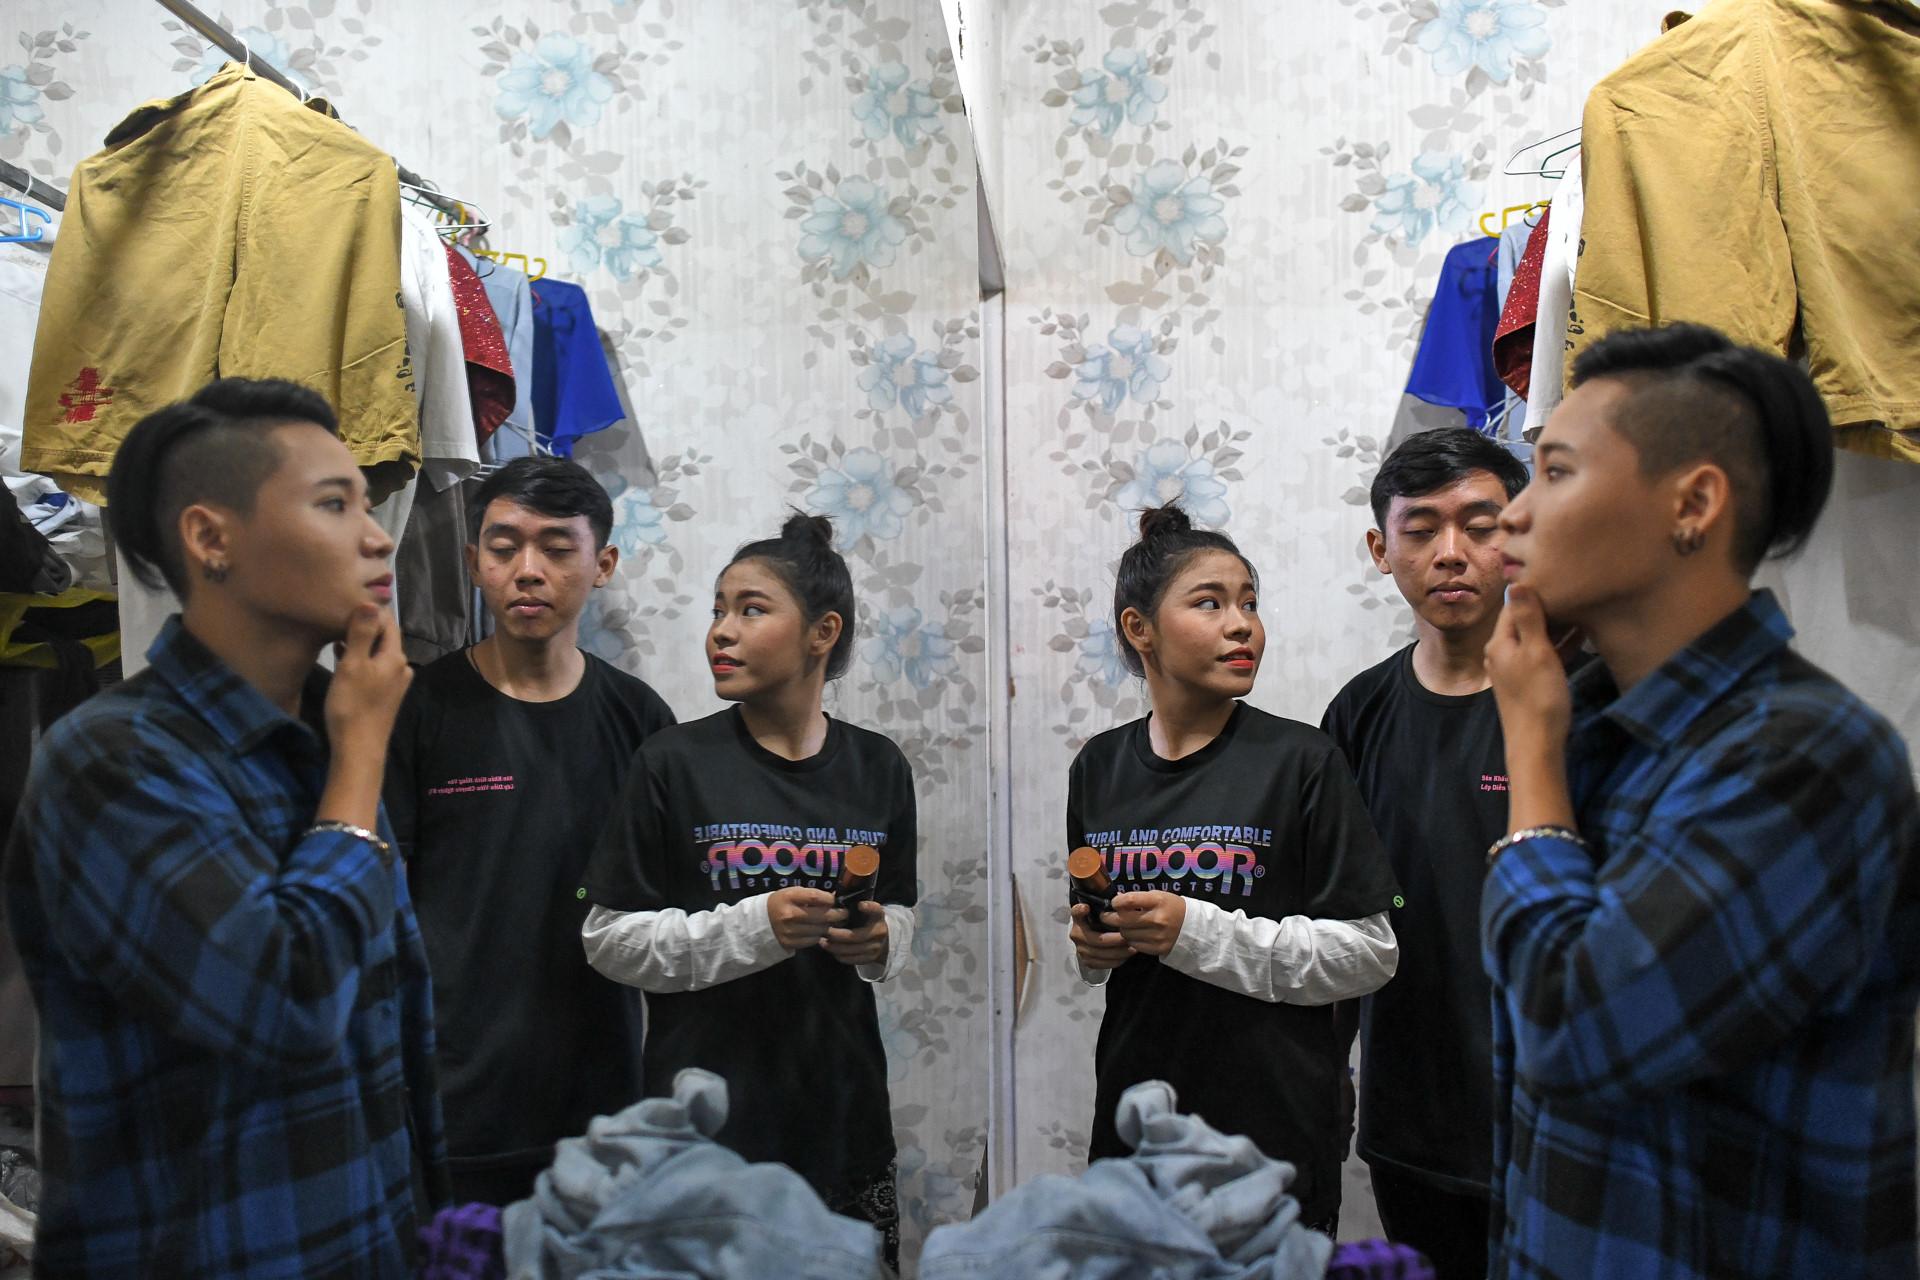 Dem dien cuoi o san khau Hong Van: Chuyen sau tam man nhung hinh anh 13